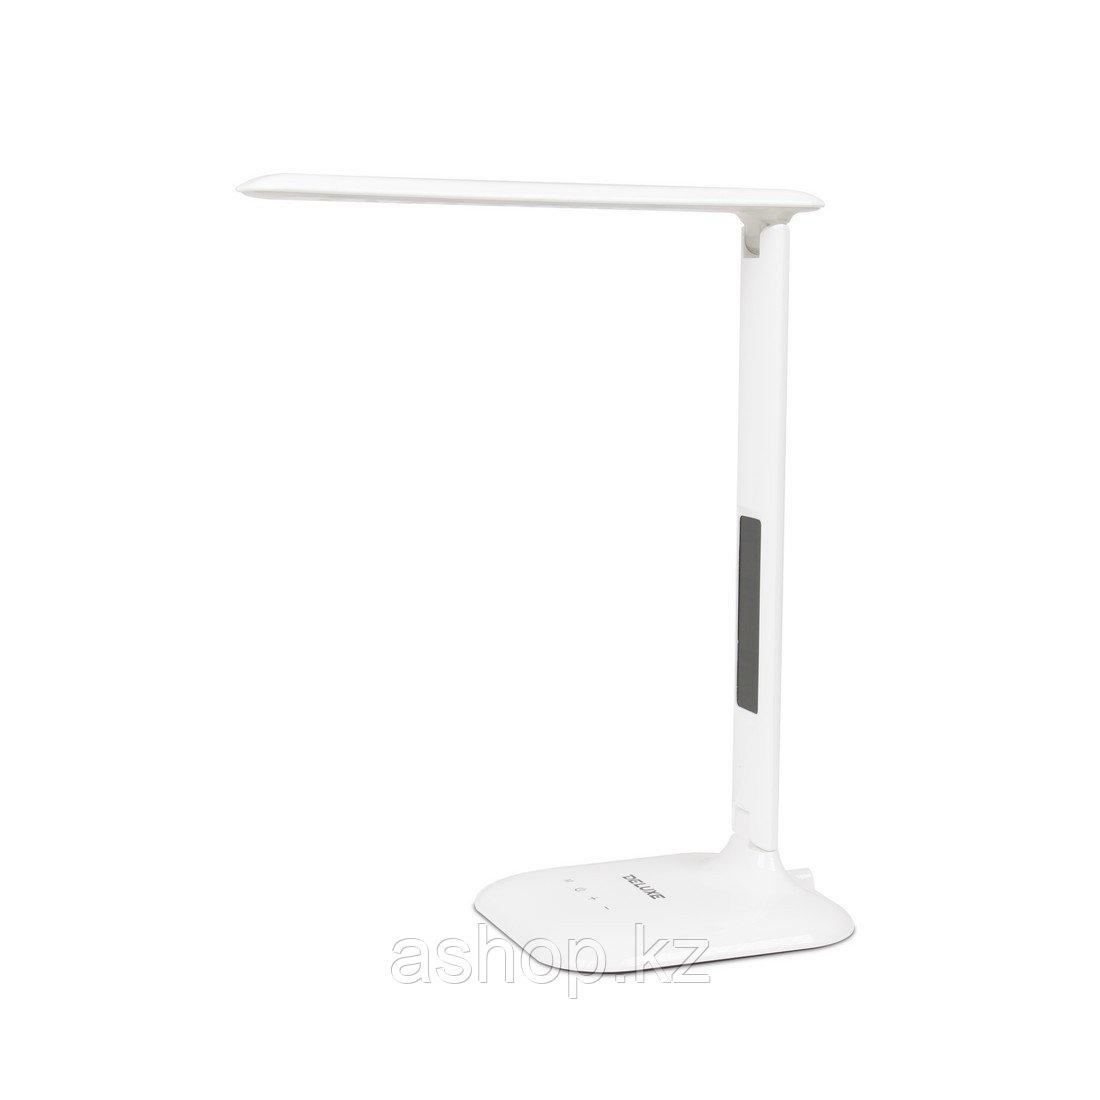 Лампа настольная светодиодная (LED) Deluxe DLTL-306W-9W, Регулировка яркости: 3 степени яркости, Цветовая темп